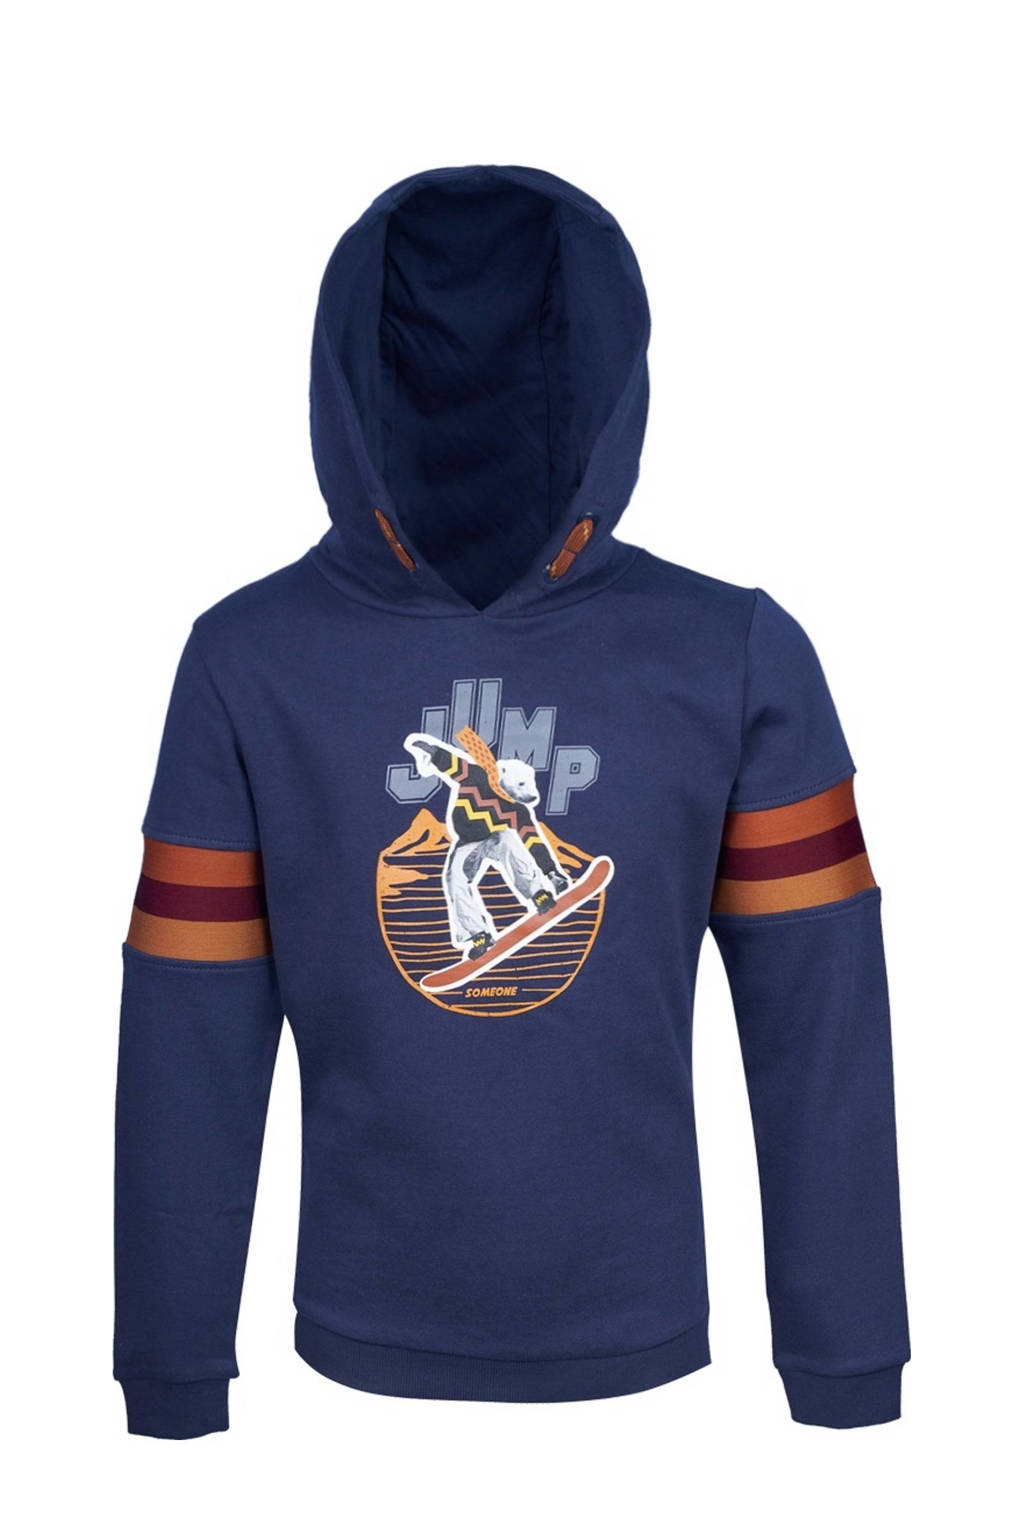 Someone hoodie Icebear met printopdruk donkerblauw/oranje, Donkerblauw/oranje